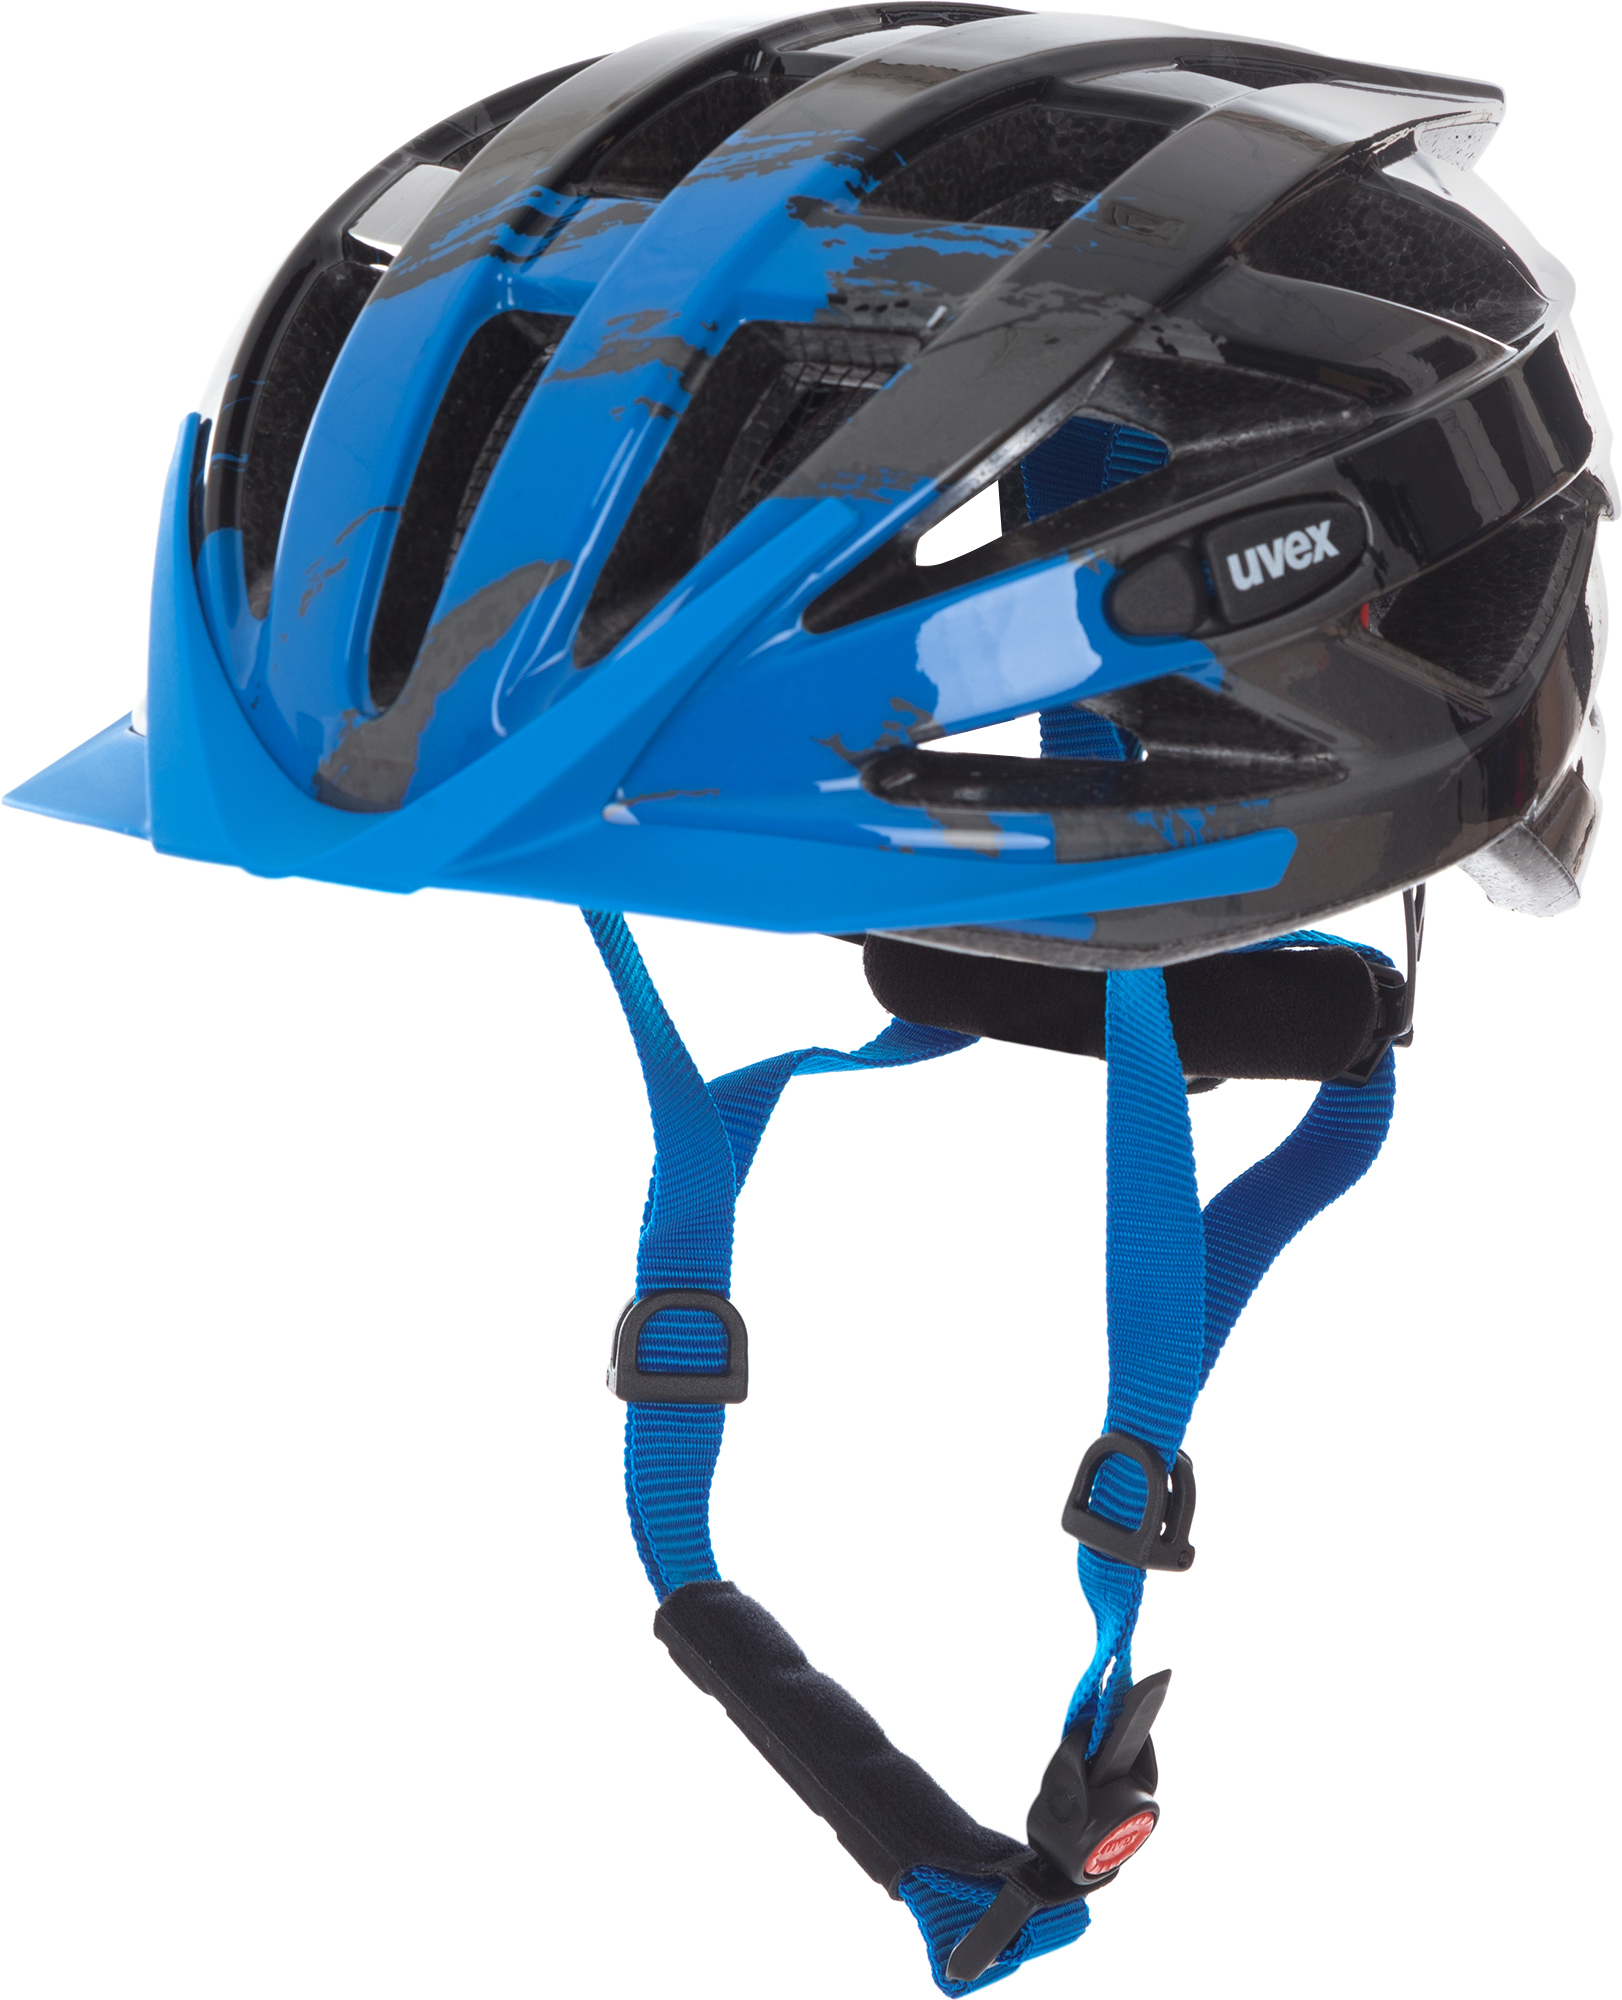 Uvex Шлем велосипедный Uvex i-vo c, размер 56-60